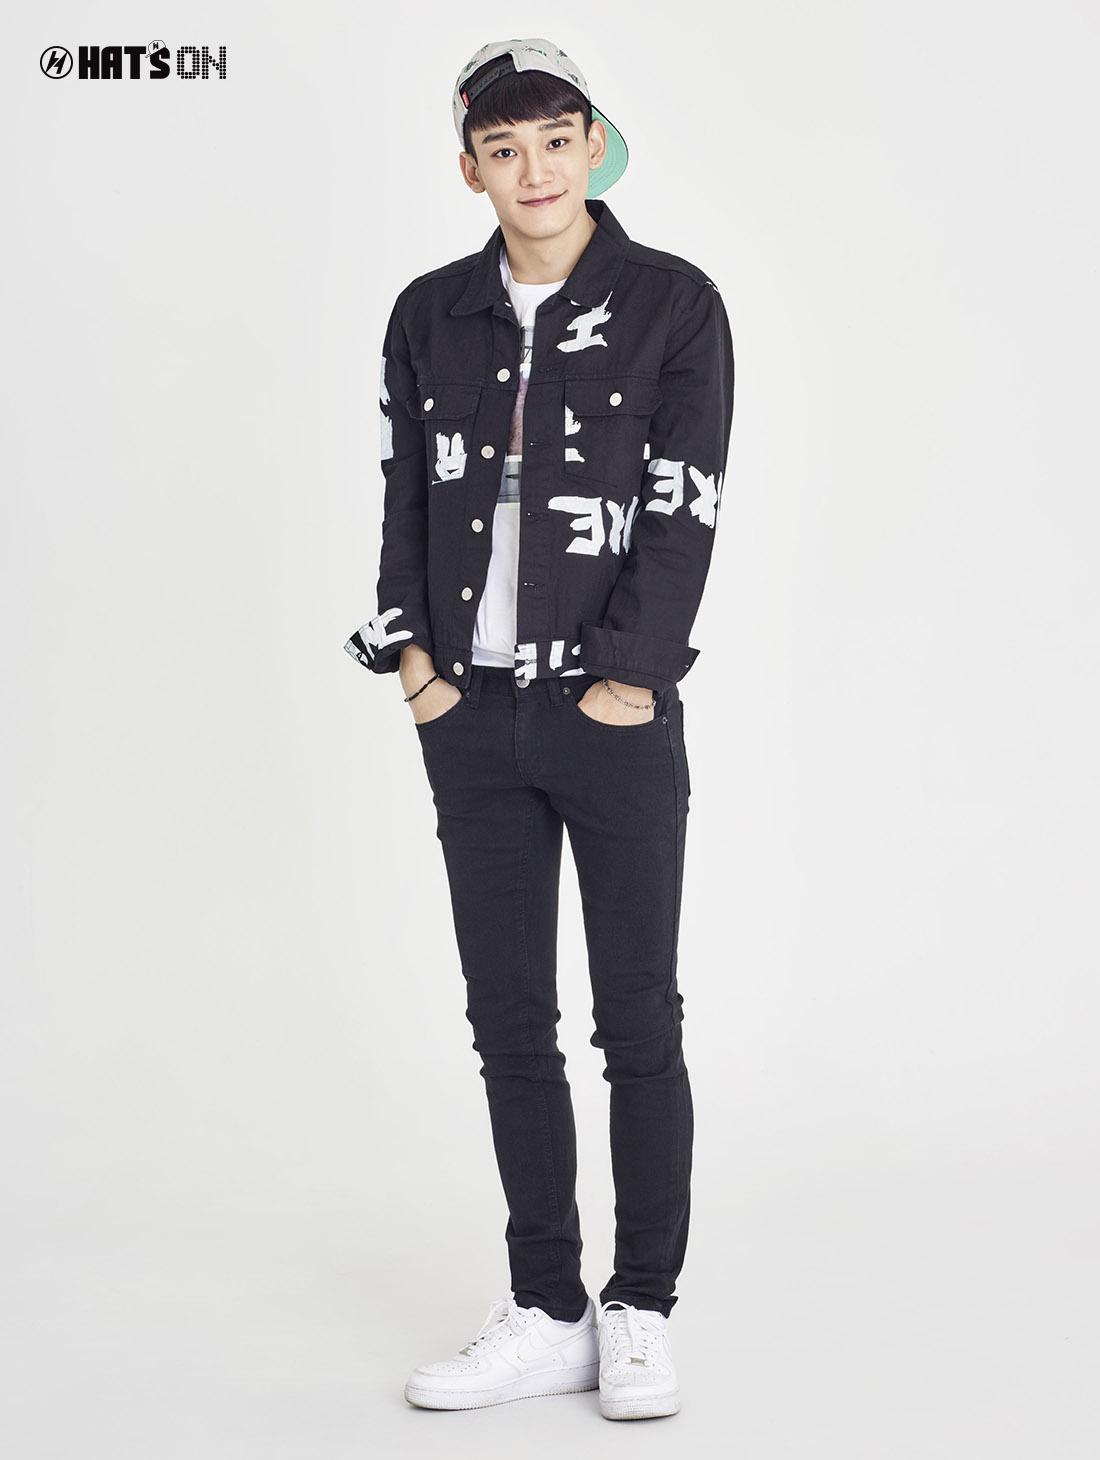 Xiumin And Sehun Photoshoot] EXO for Ha...